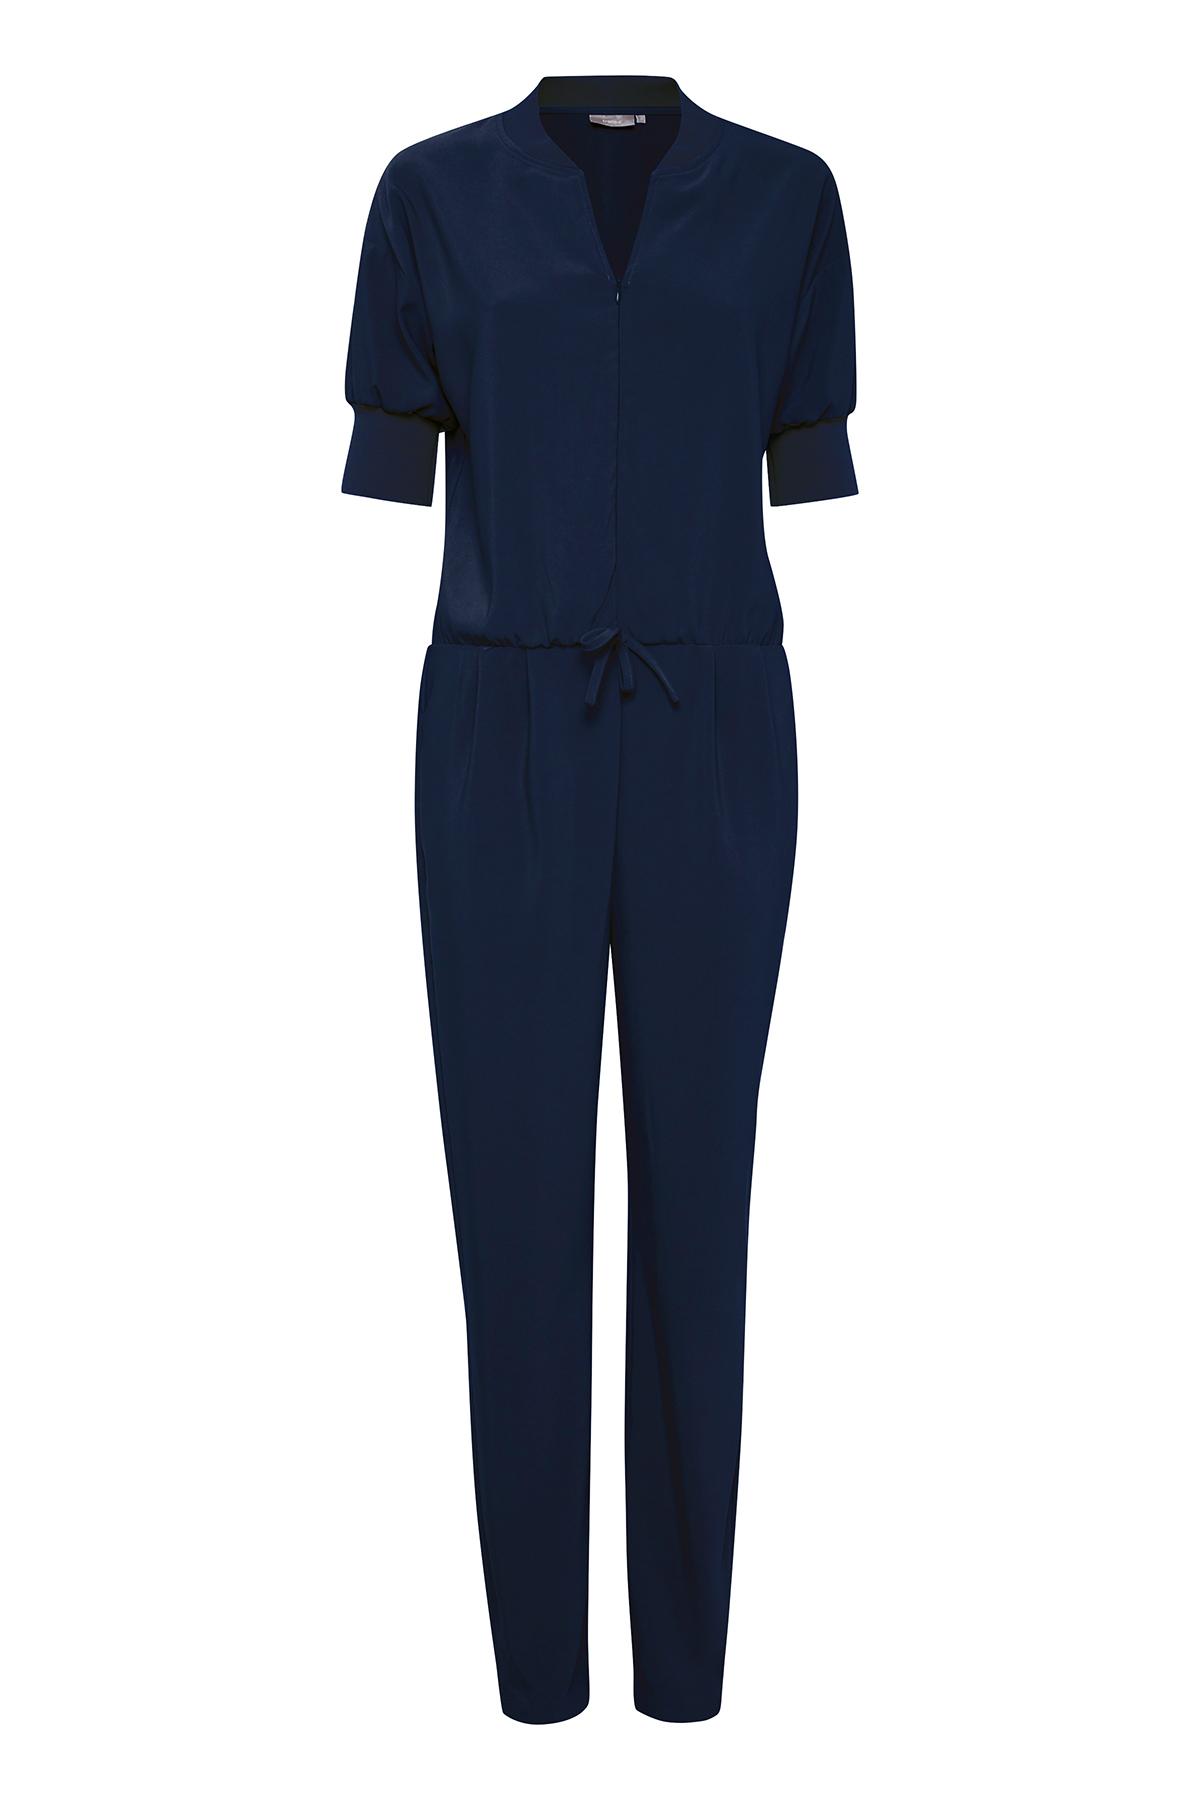 Fransa Dame Jumpsuit - Marineblå